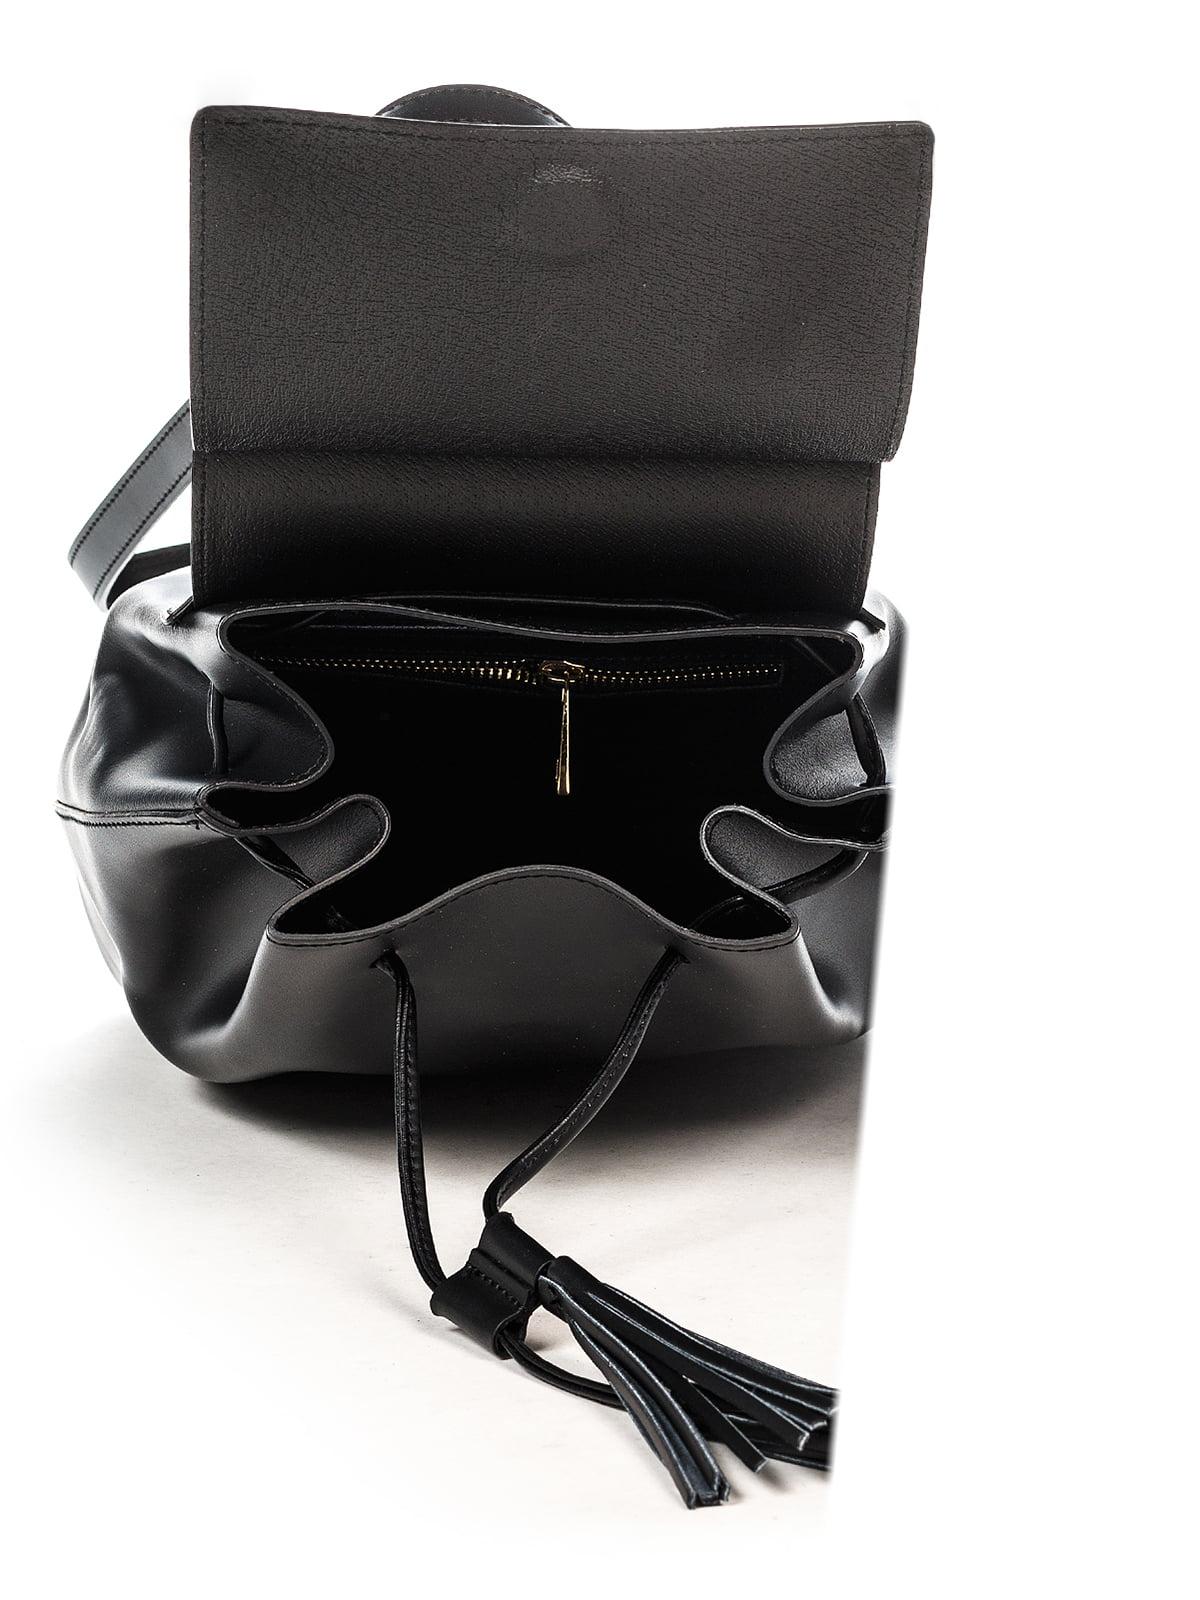 Рюкзак чорний | 4979548 | фото 4